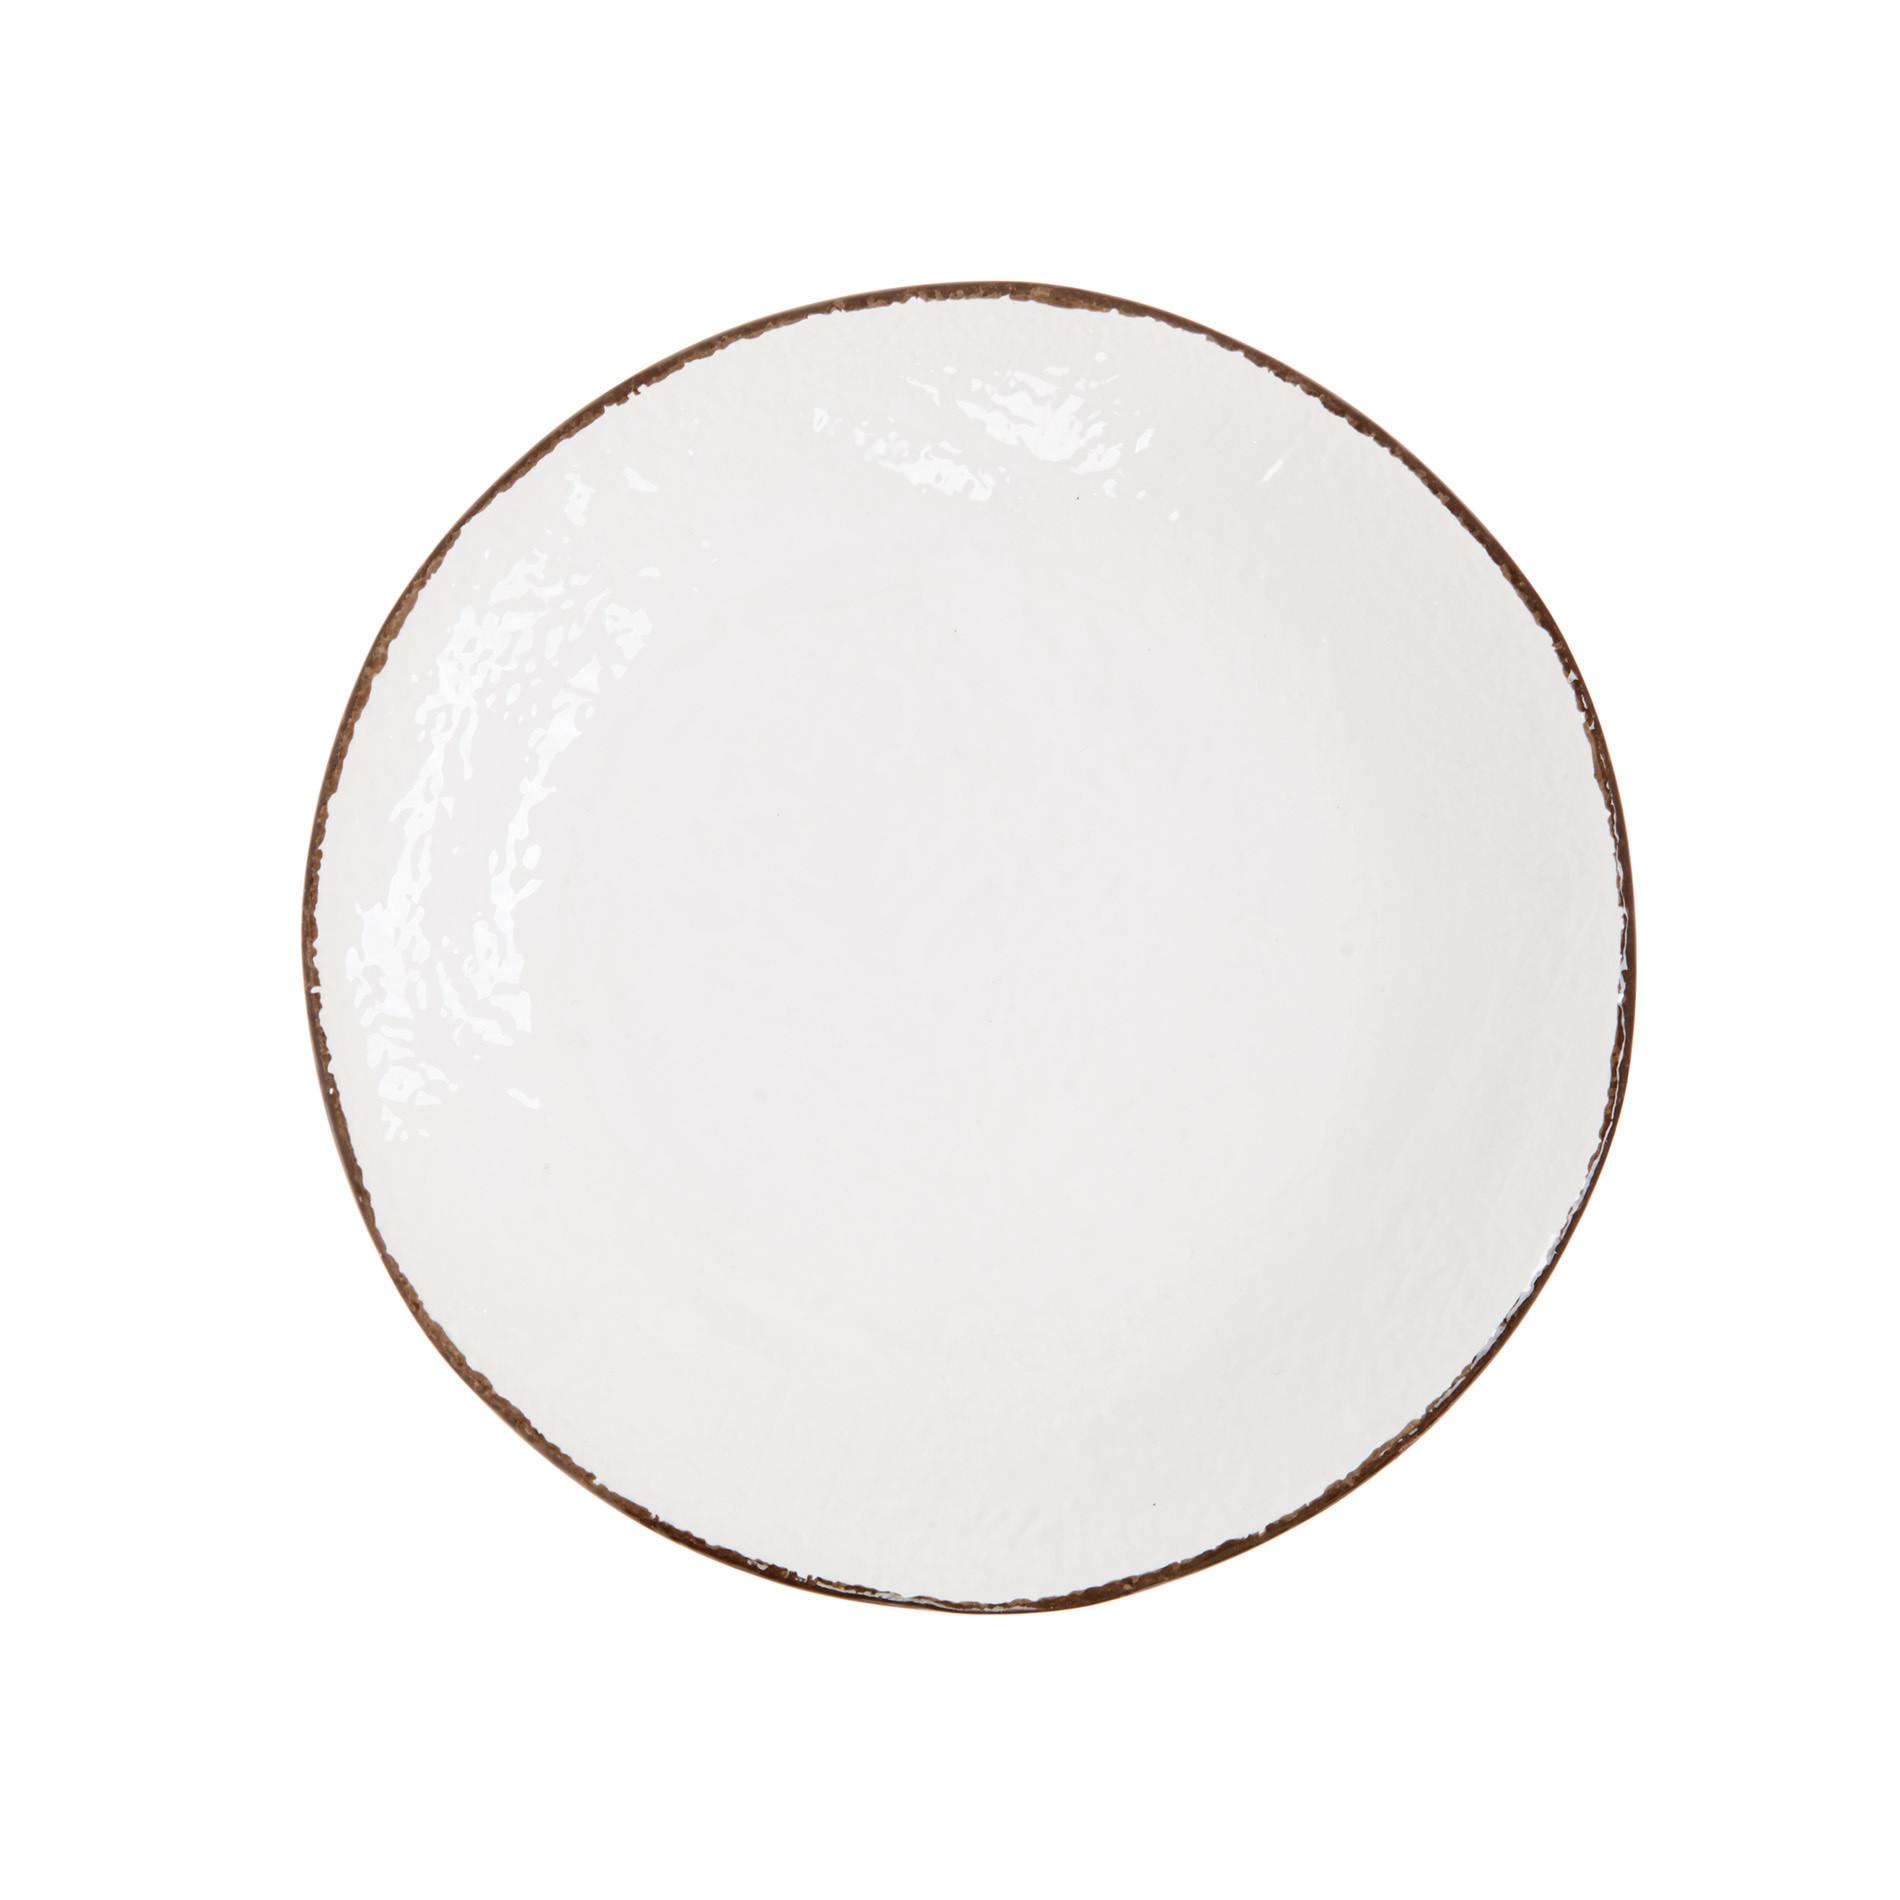 Piatto piano ceramica artigianale Preta, Bianco, large image number 1